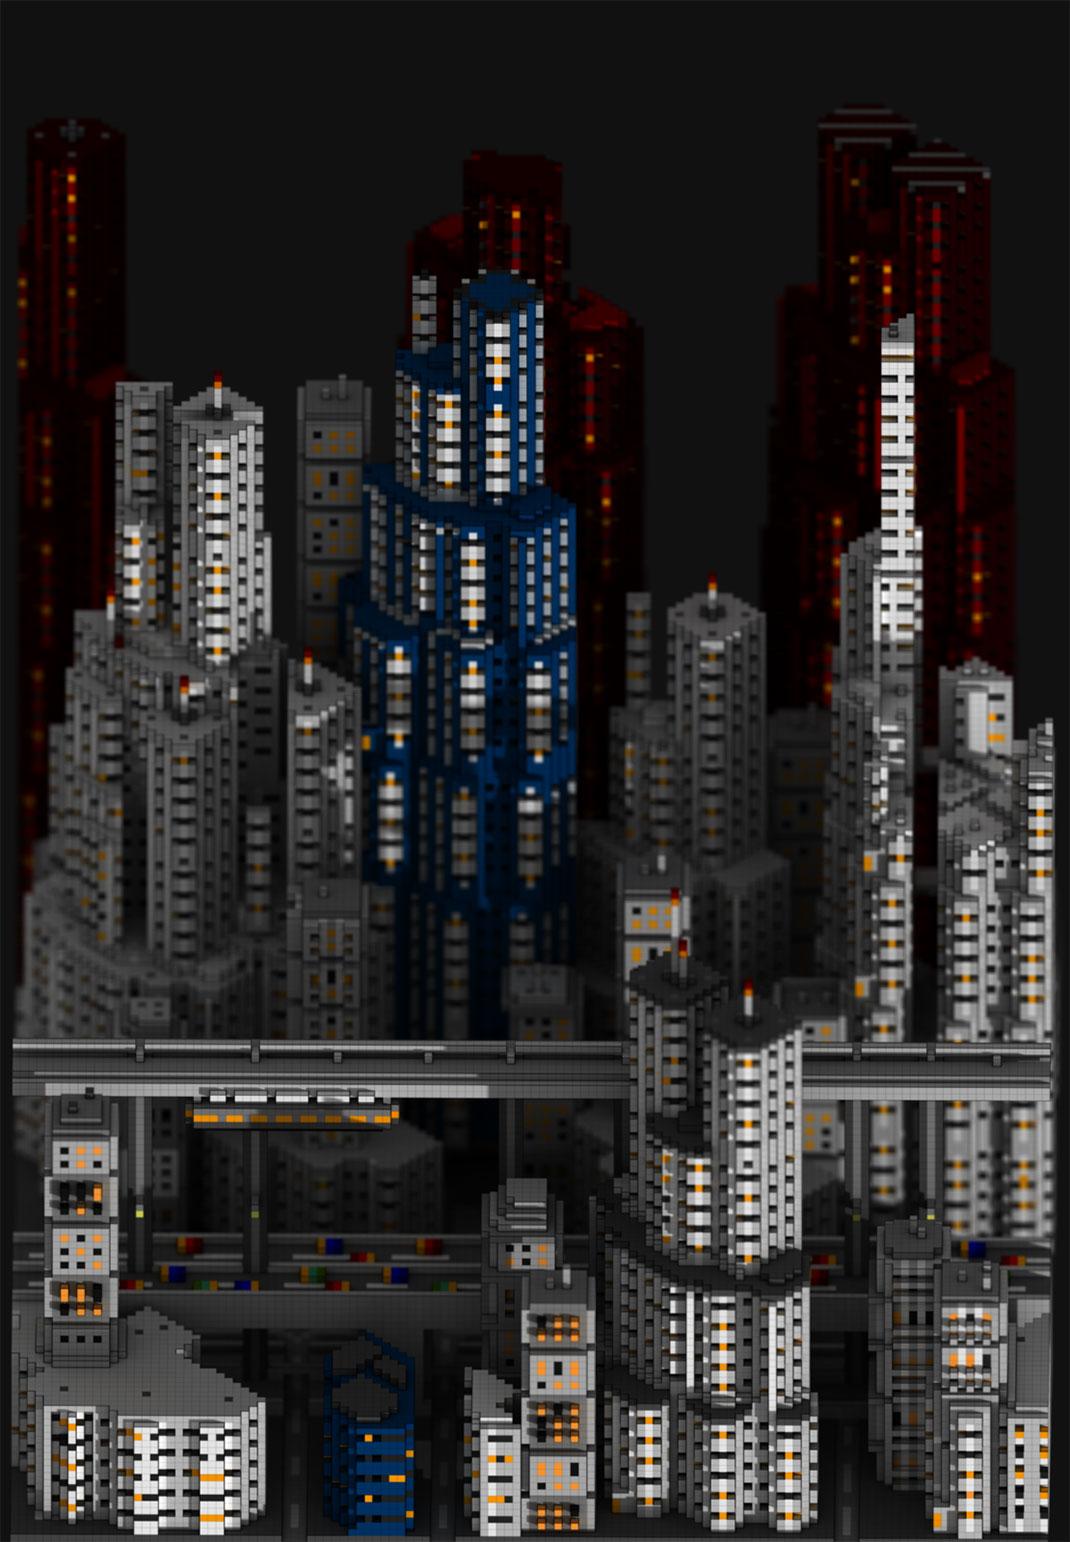 sf-ville-carma-voxel